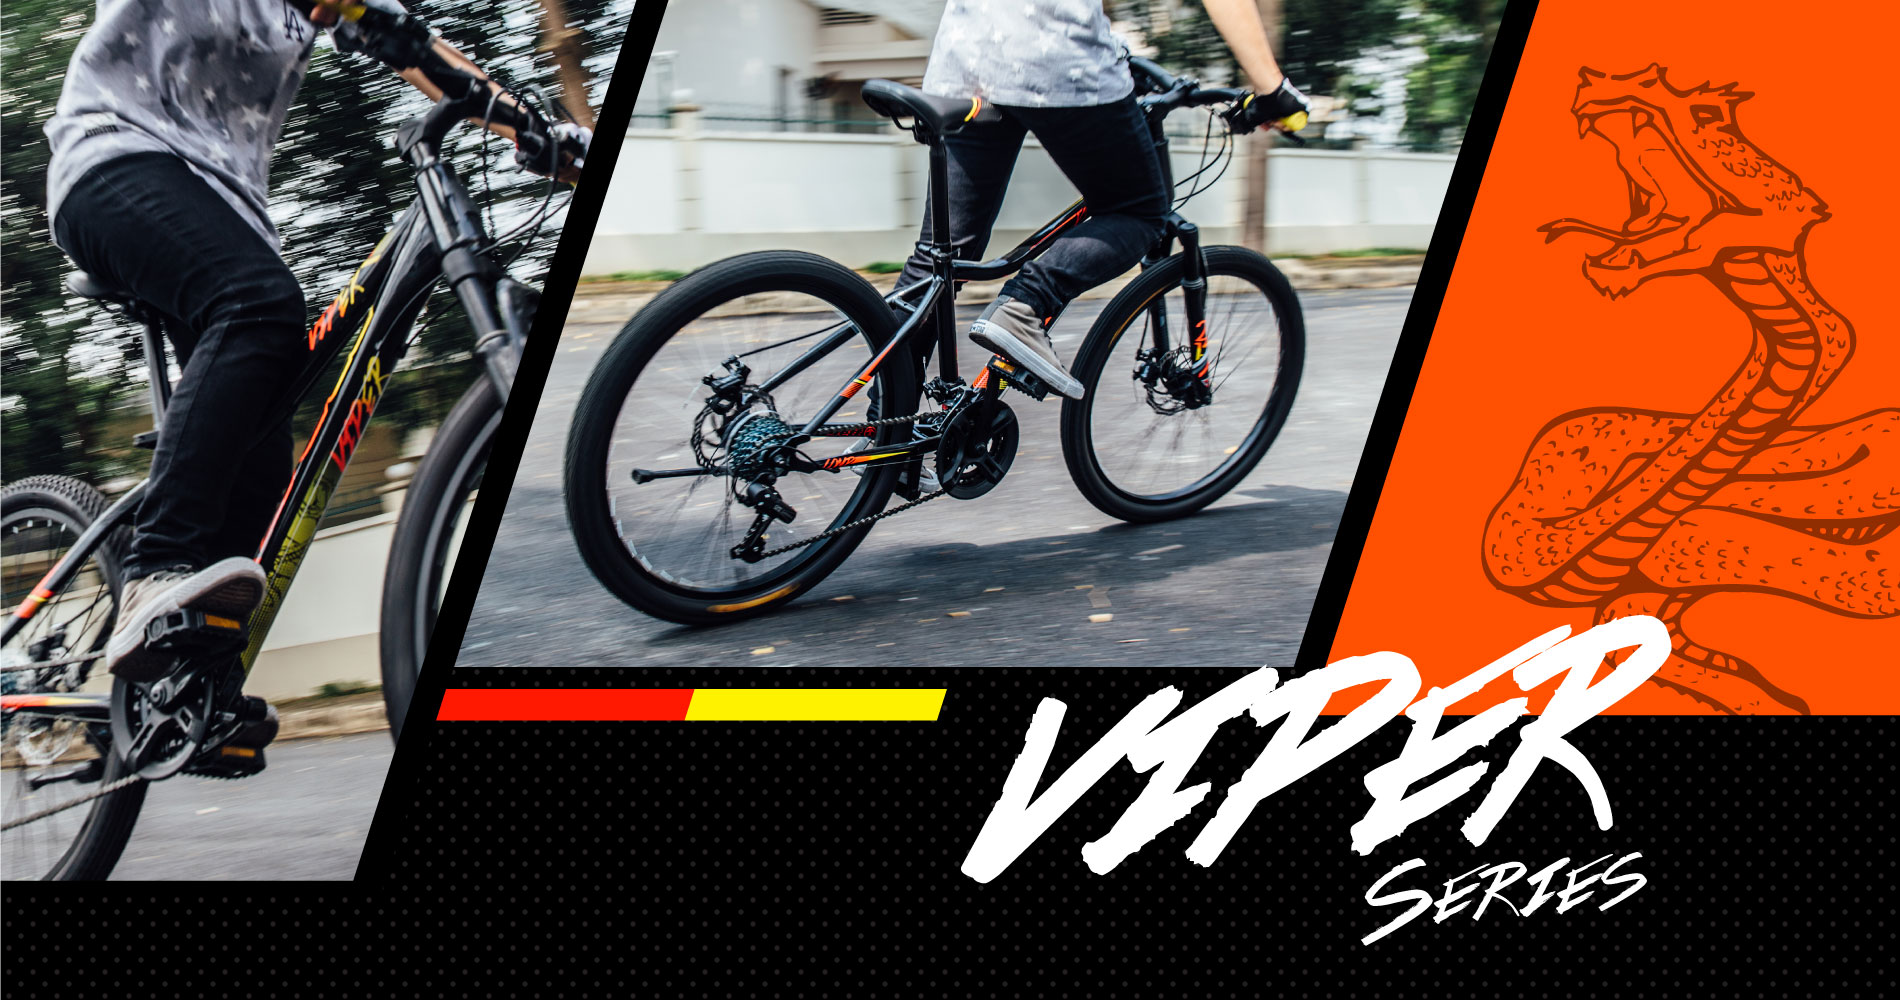 Viper 2017